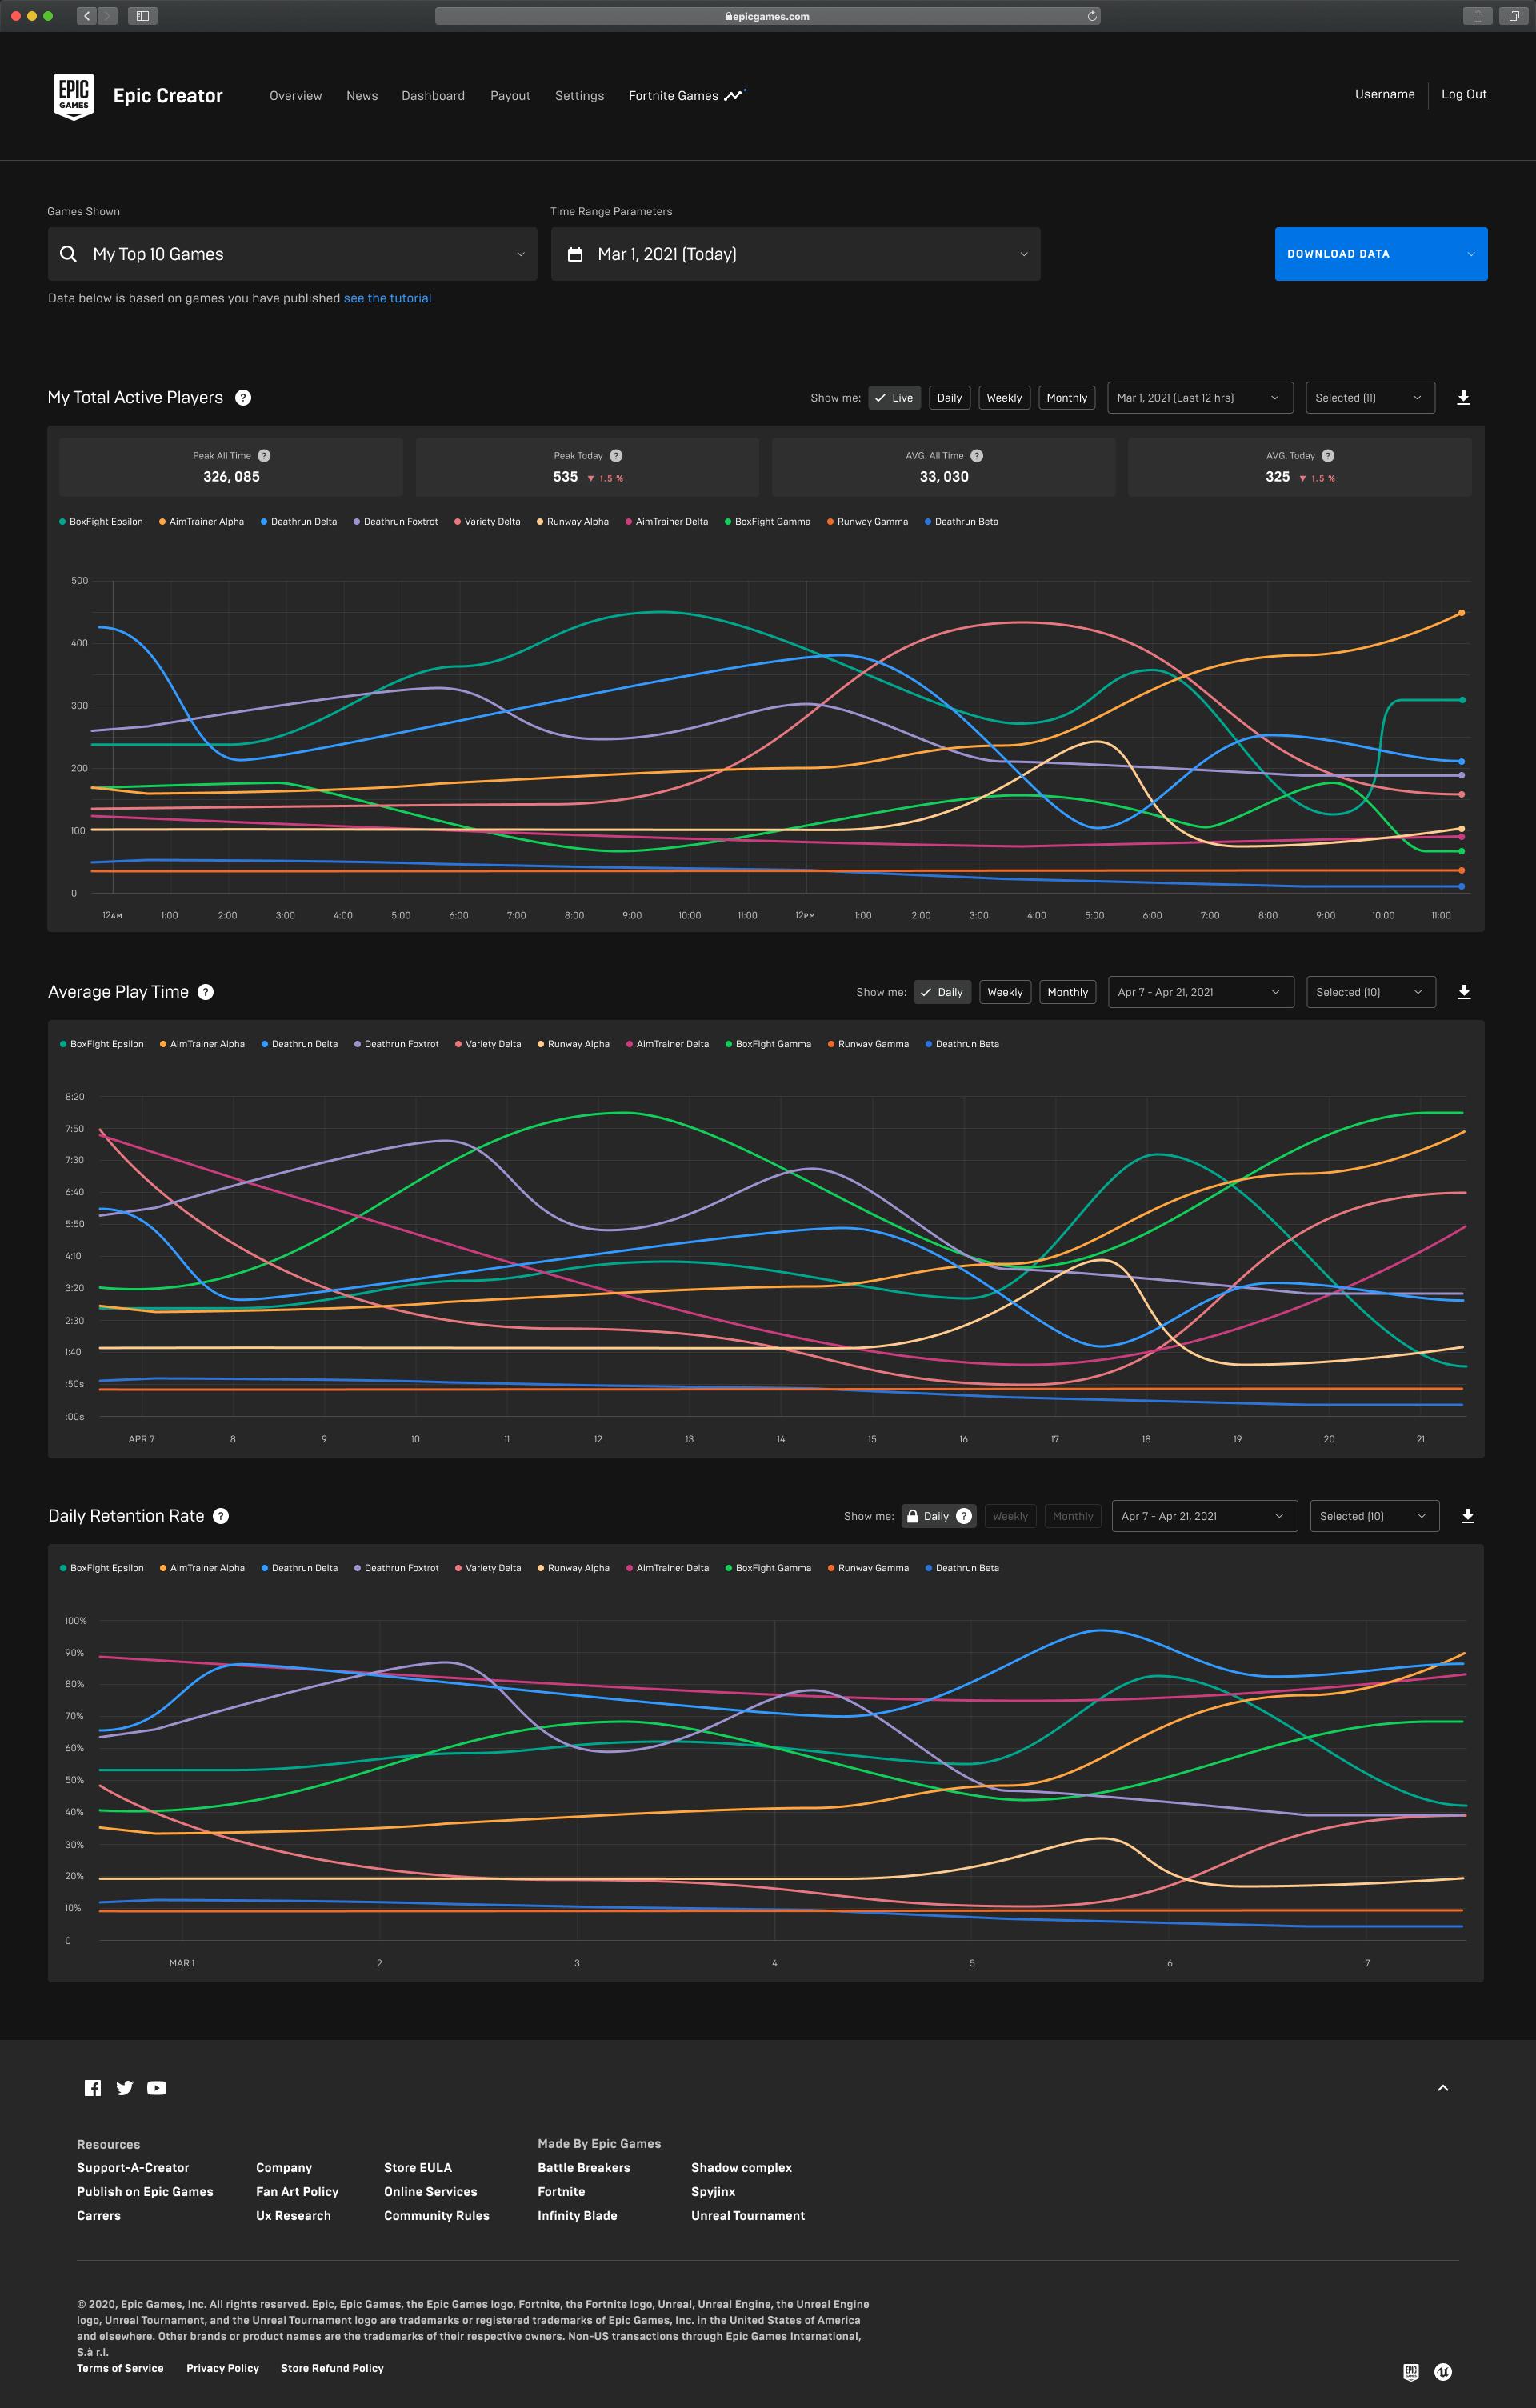 Analytics for Fortnite Creators